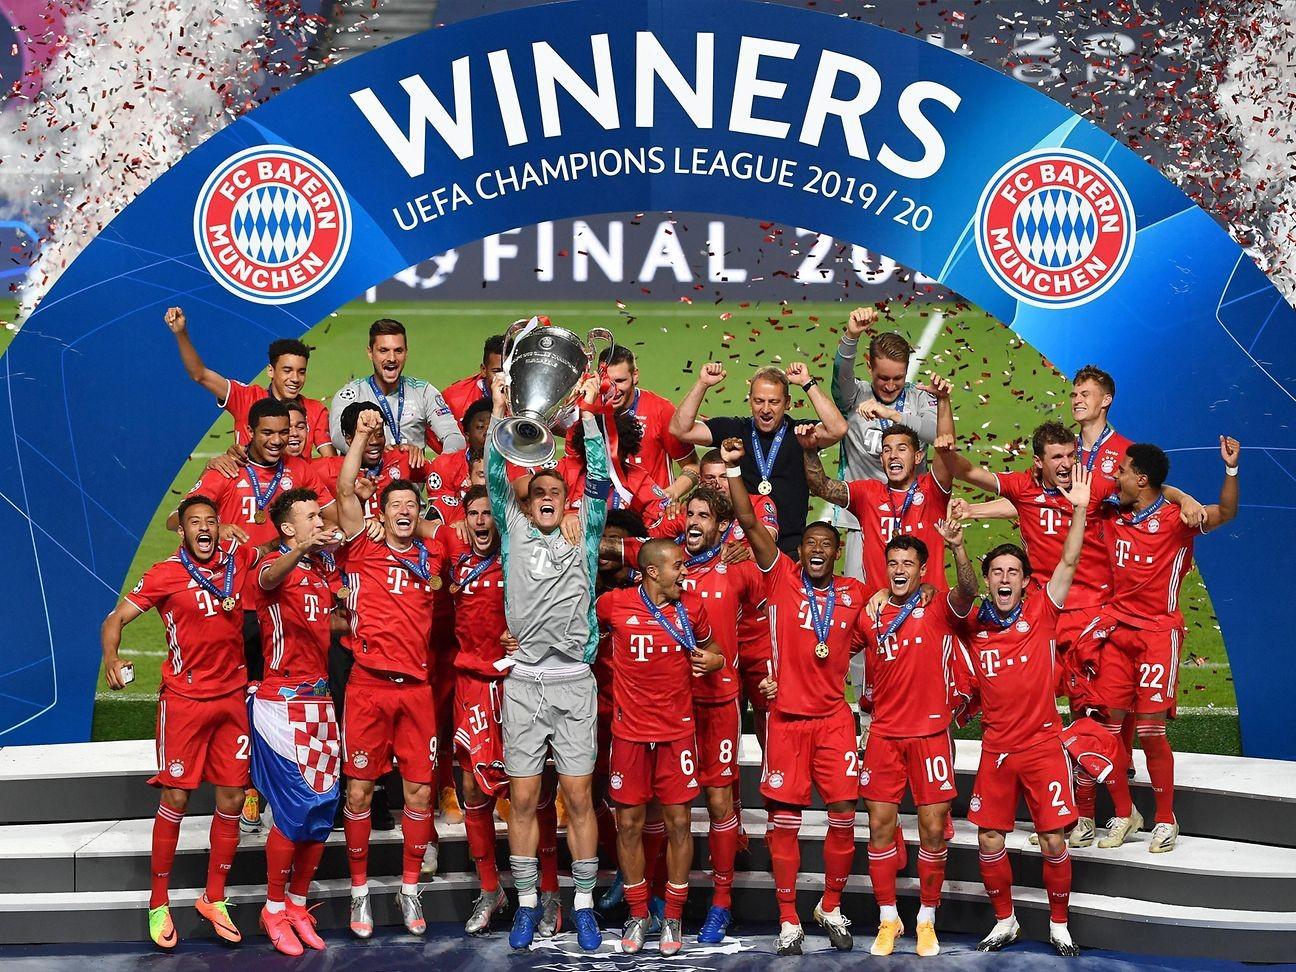 Bayern Monaco Champions League premiazione 2020